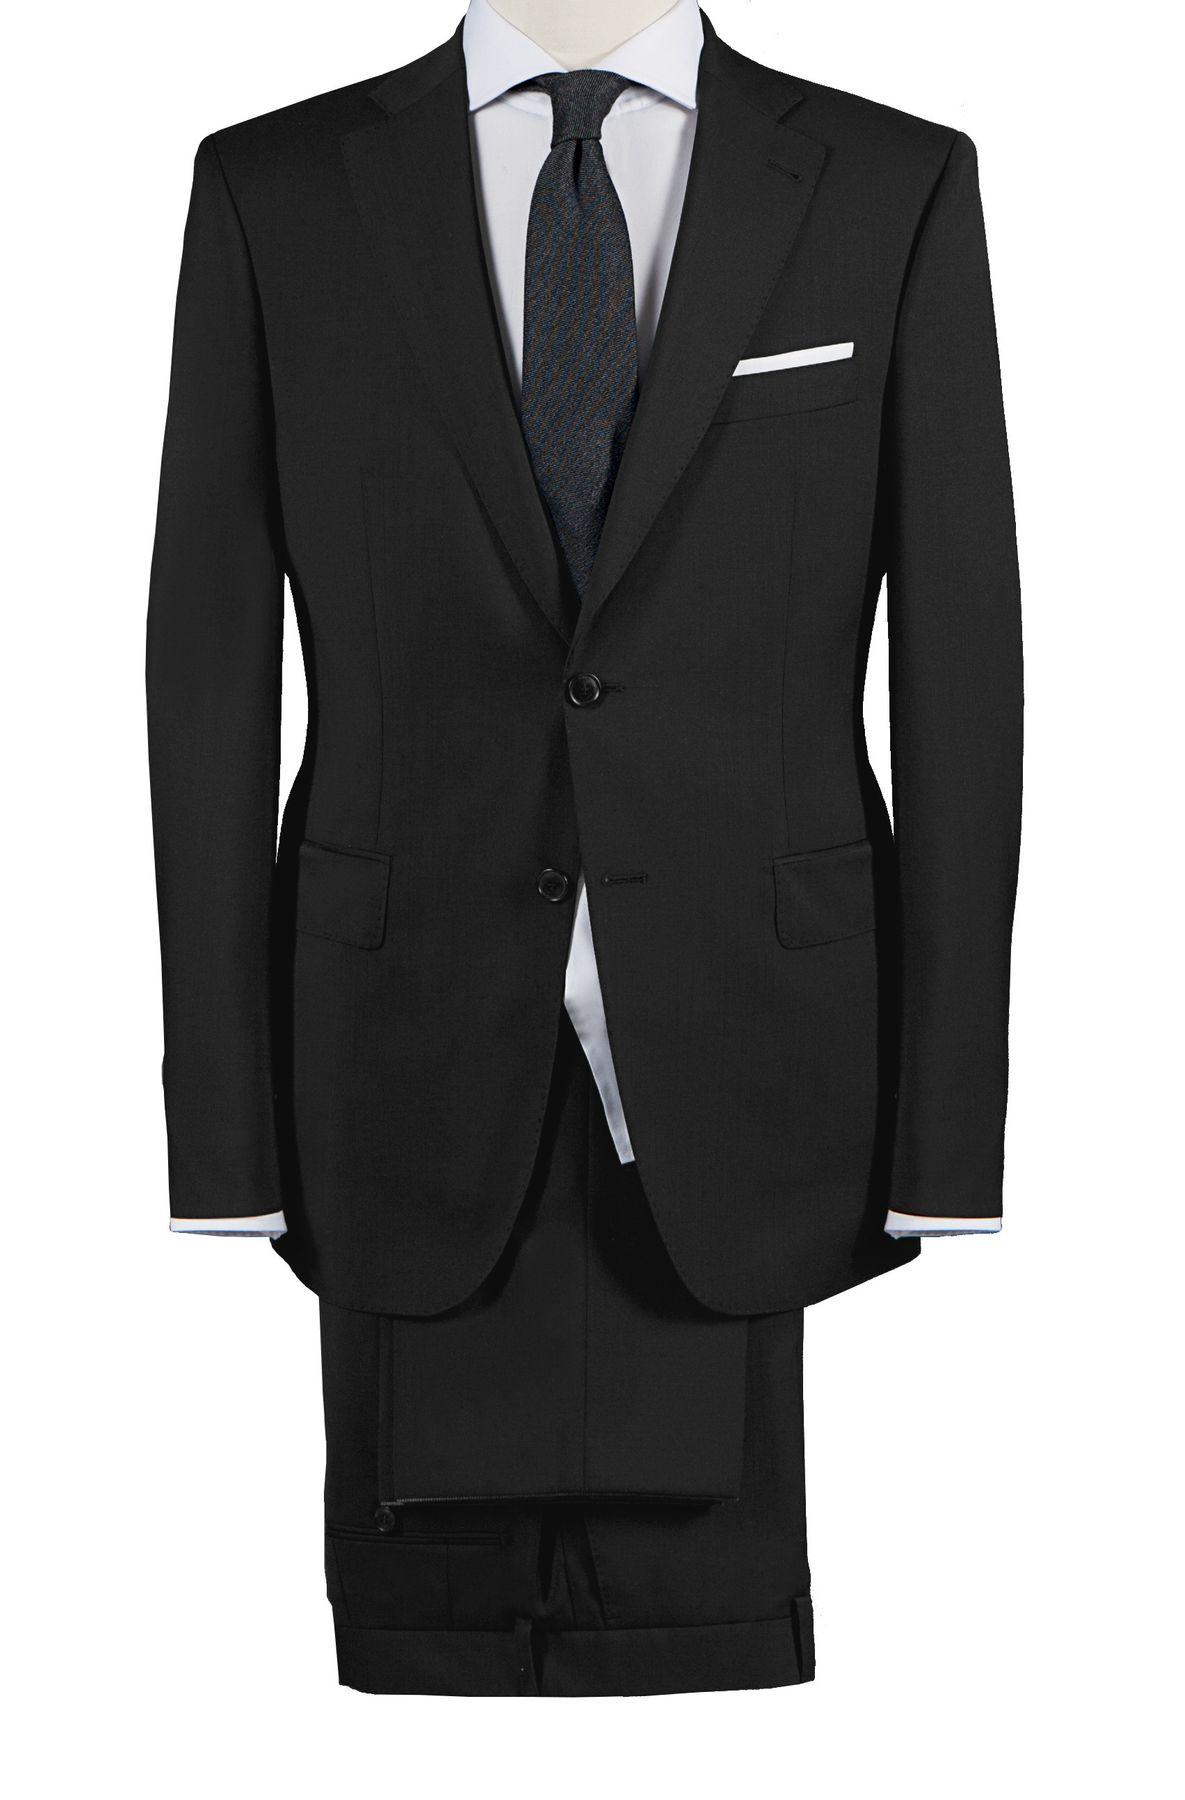 Barutti - Tailored Fit - Herren Baukasten Anzug/Reiseanzug, 900 8009 (Tarso P AMF/Tosco) – Bild 2